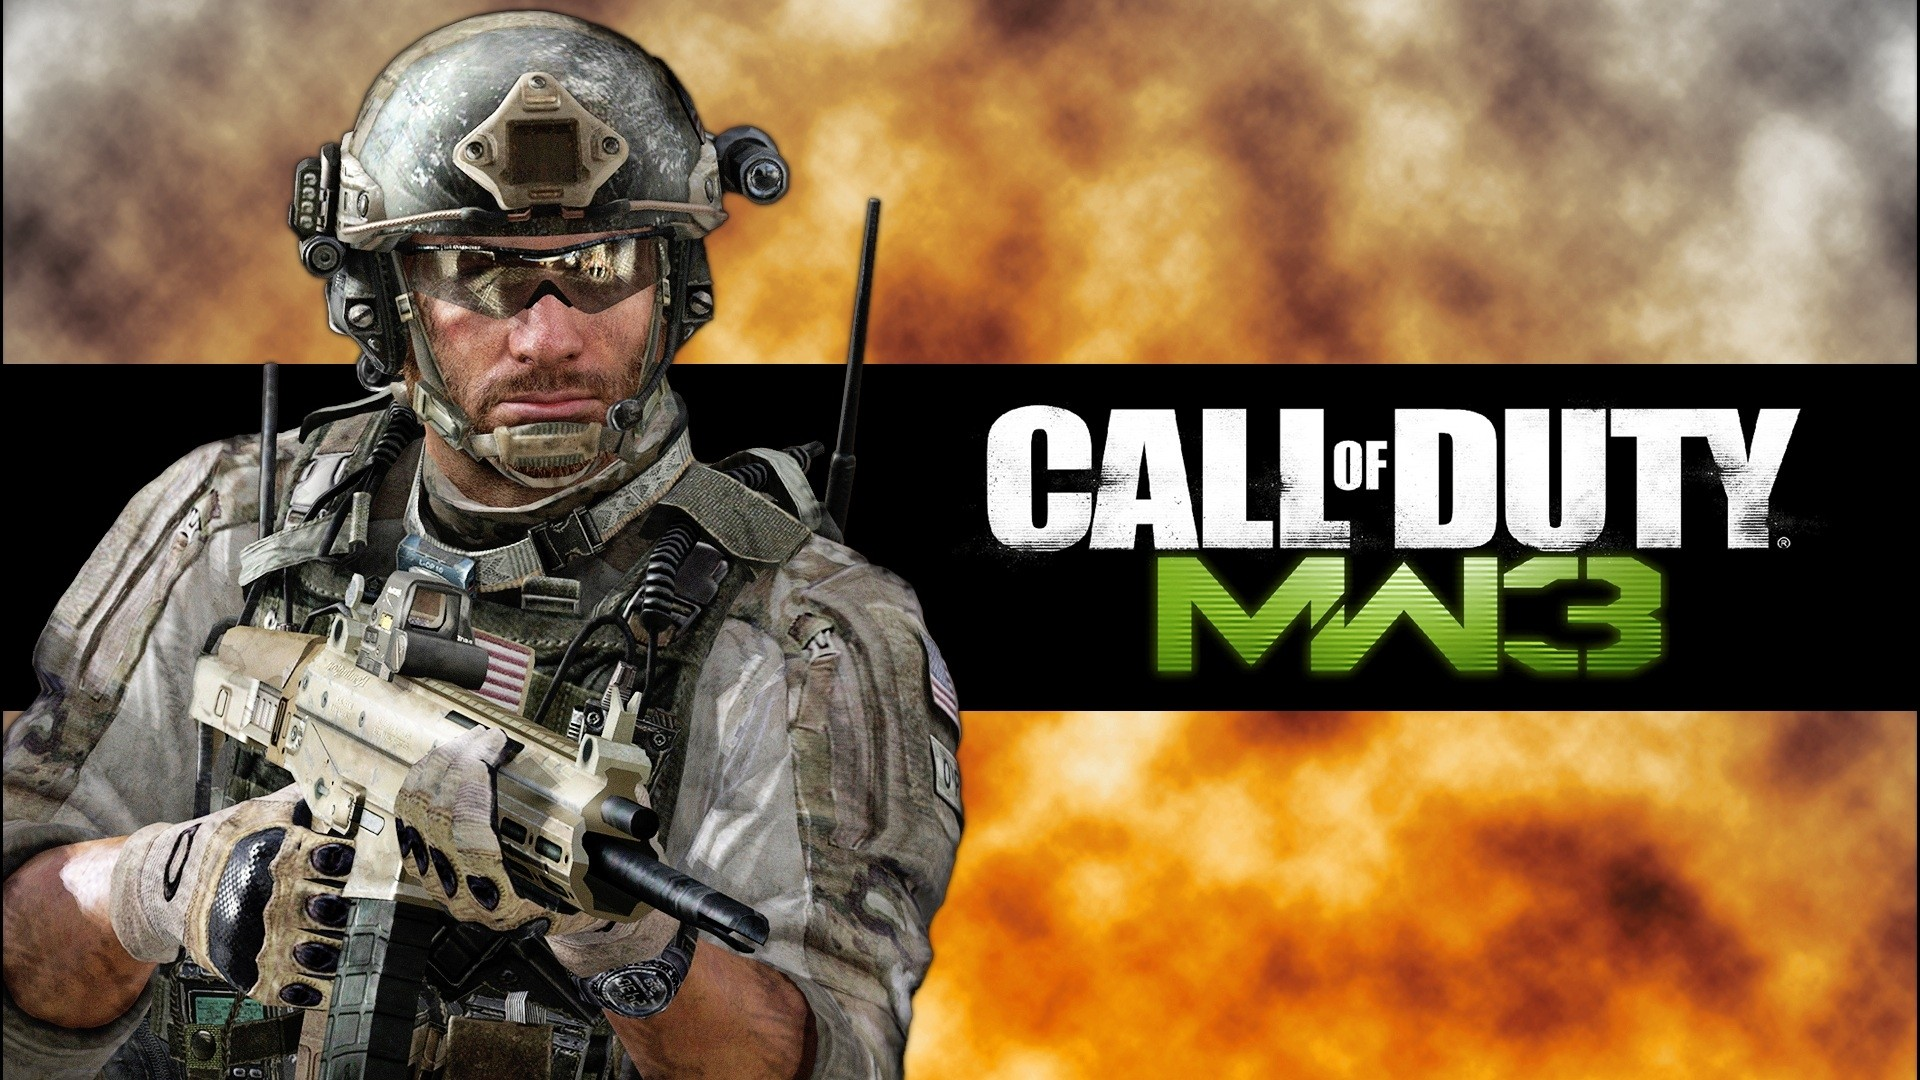 Call Of Duty: Modern Warfare 3 Wallpapers HD Wallpapers) – HD Wallpapers